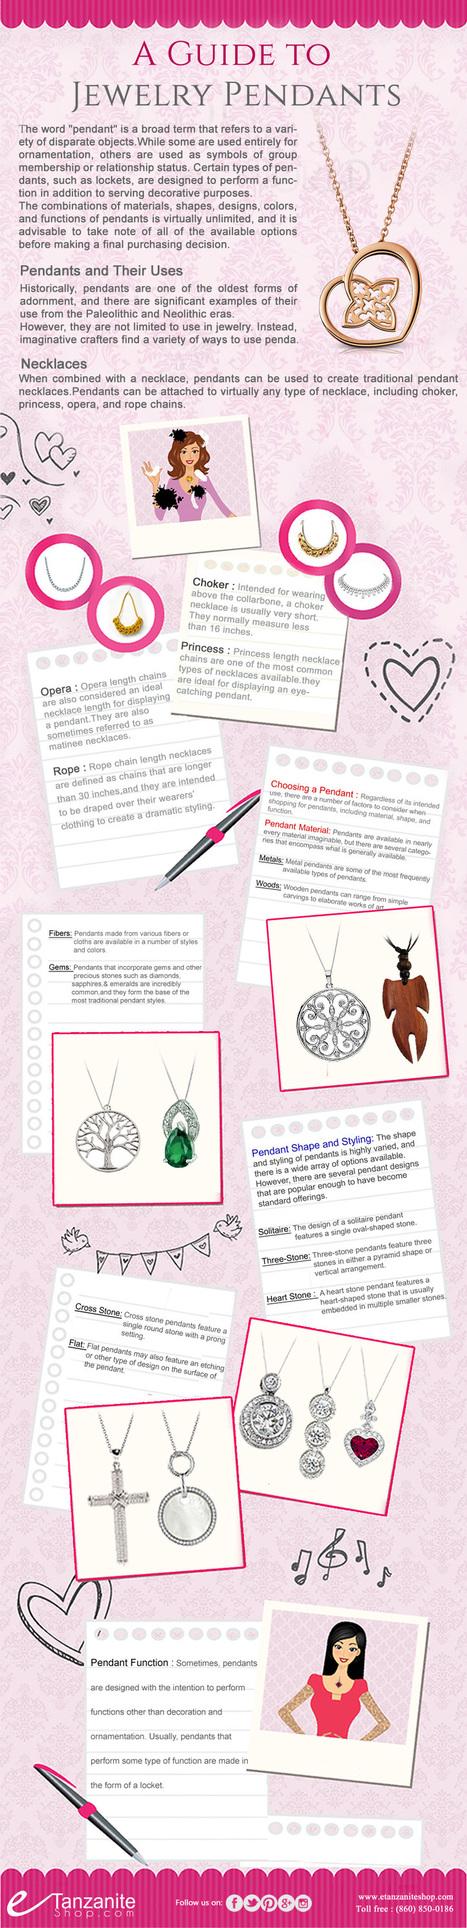 Gemstone Pendants - A Complete Guide To Jewelry Pendants | Etanzanite Shop | Scoop.it